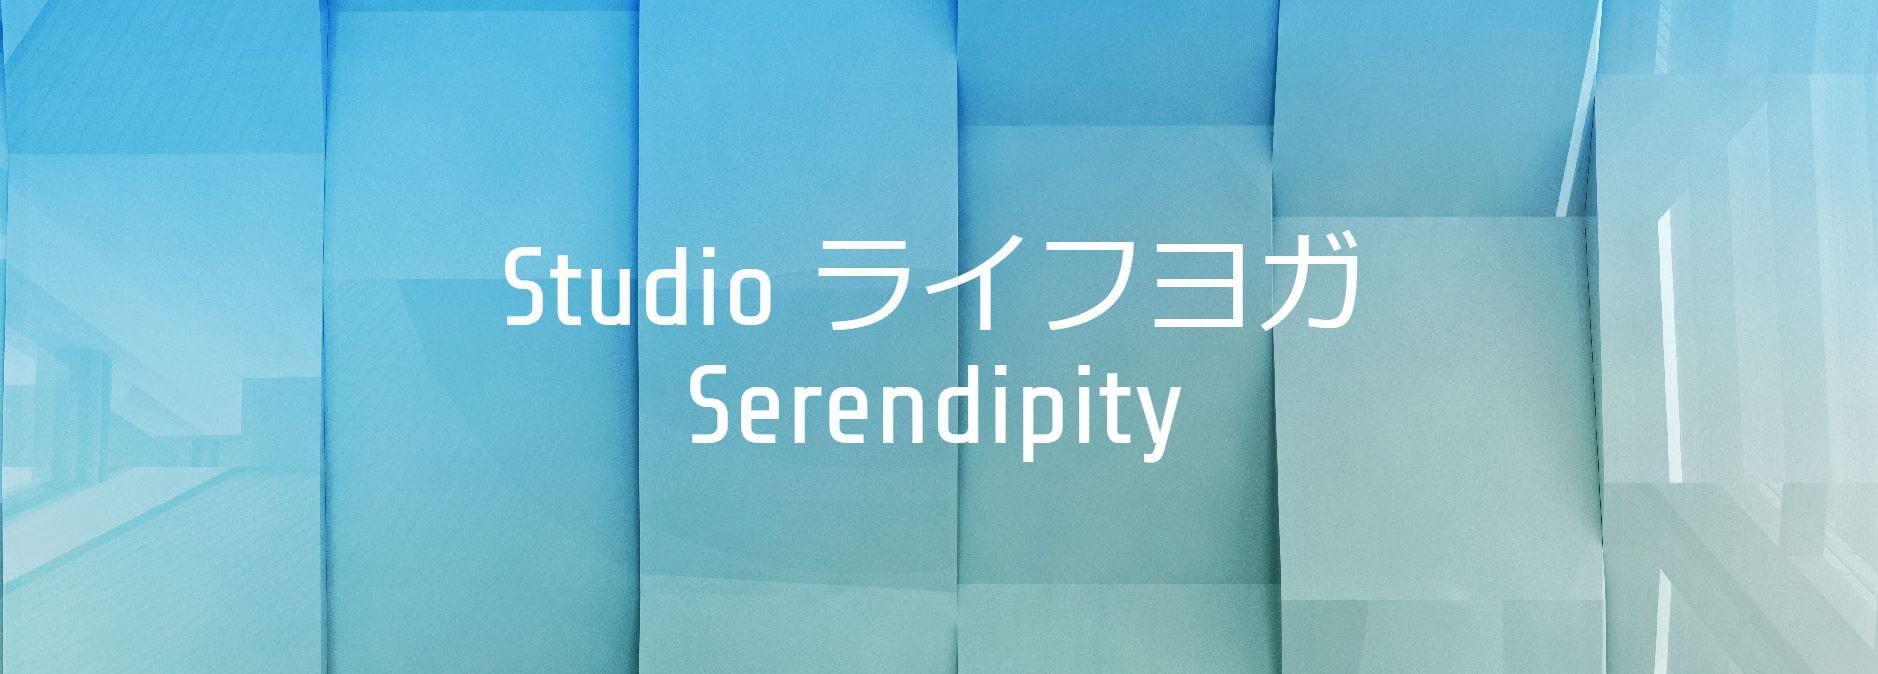 studio ライフヨガ Serendipity